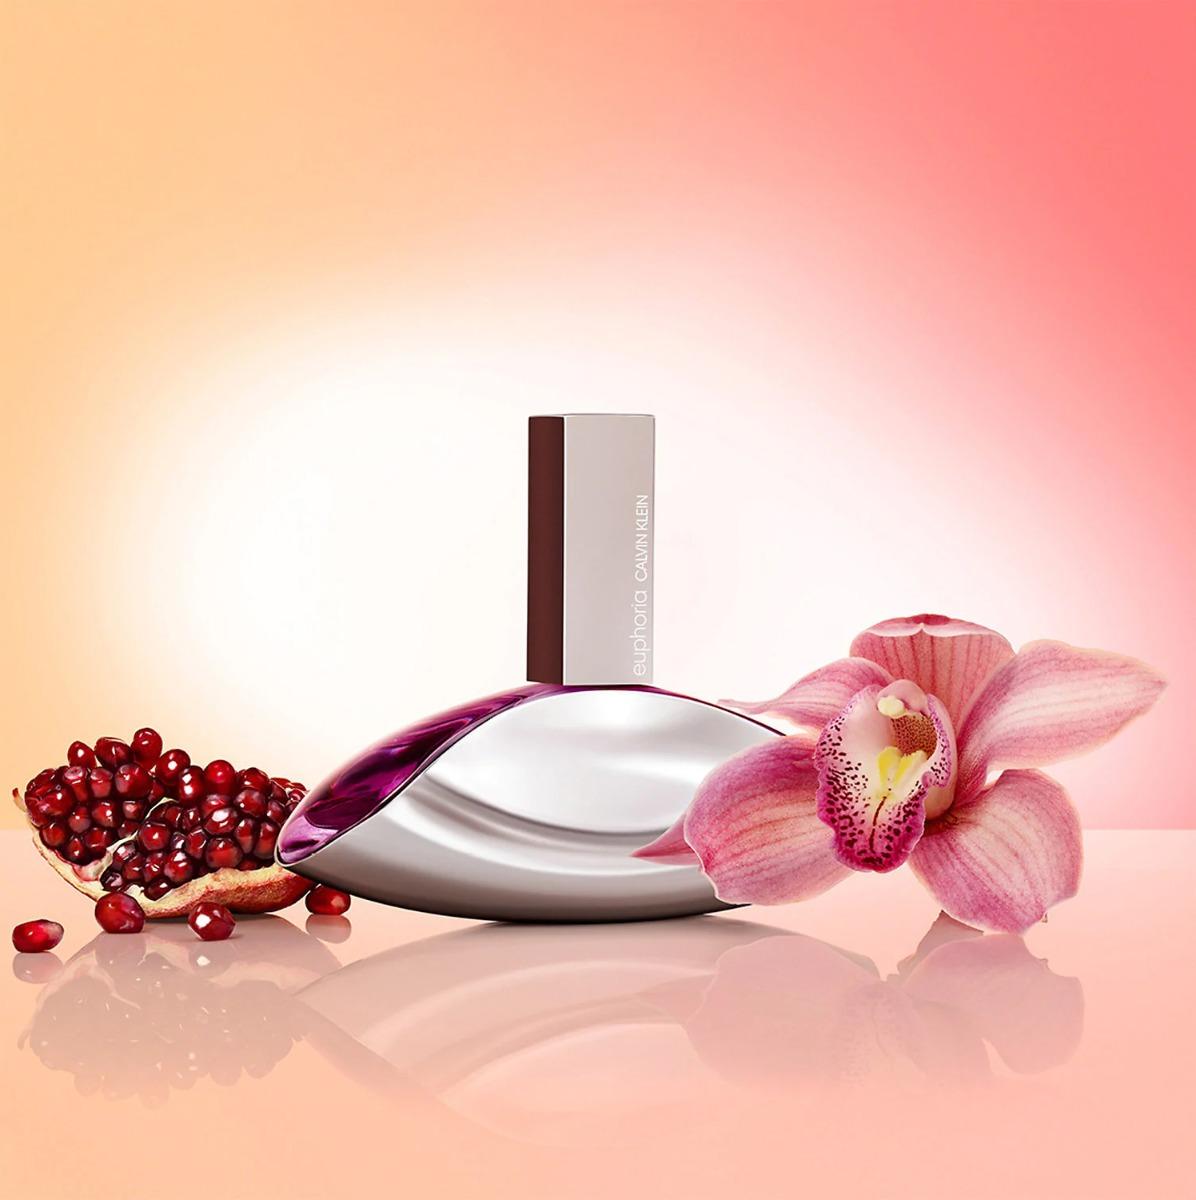 nuoc-hoa-nu-calvin-klein-euphoria-edp-thảo-perfume